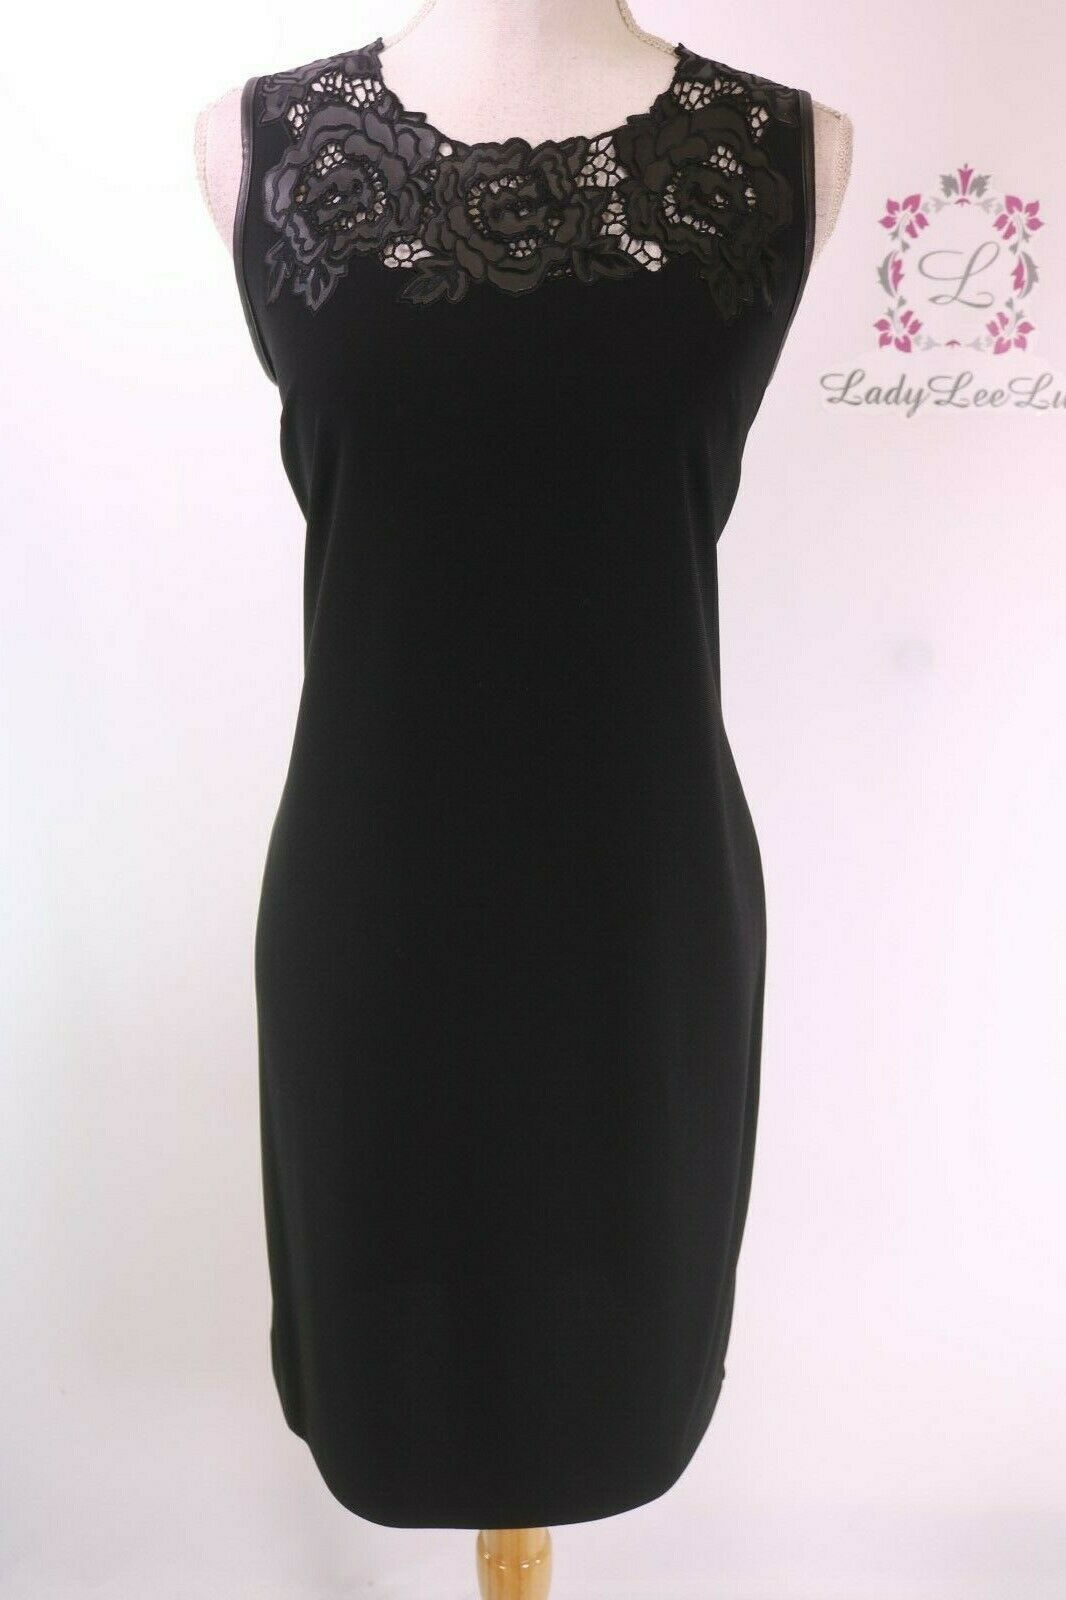 KARL LAGERFELD PARIS Floral Lace Sleeveless Shift Dress L8FD7980 Größe 6 8 NWT